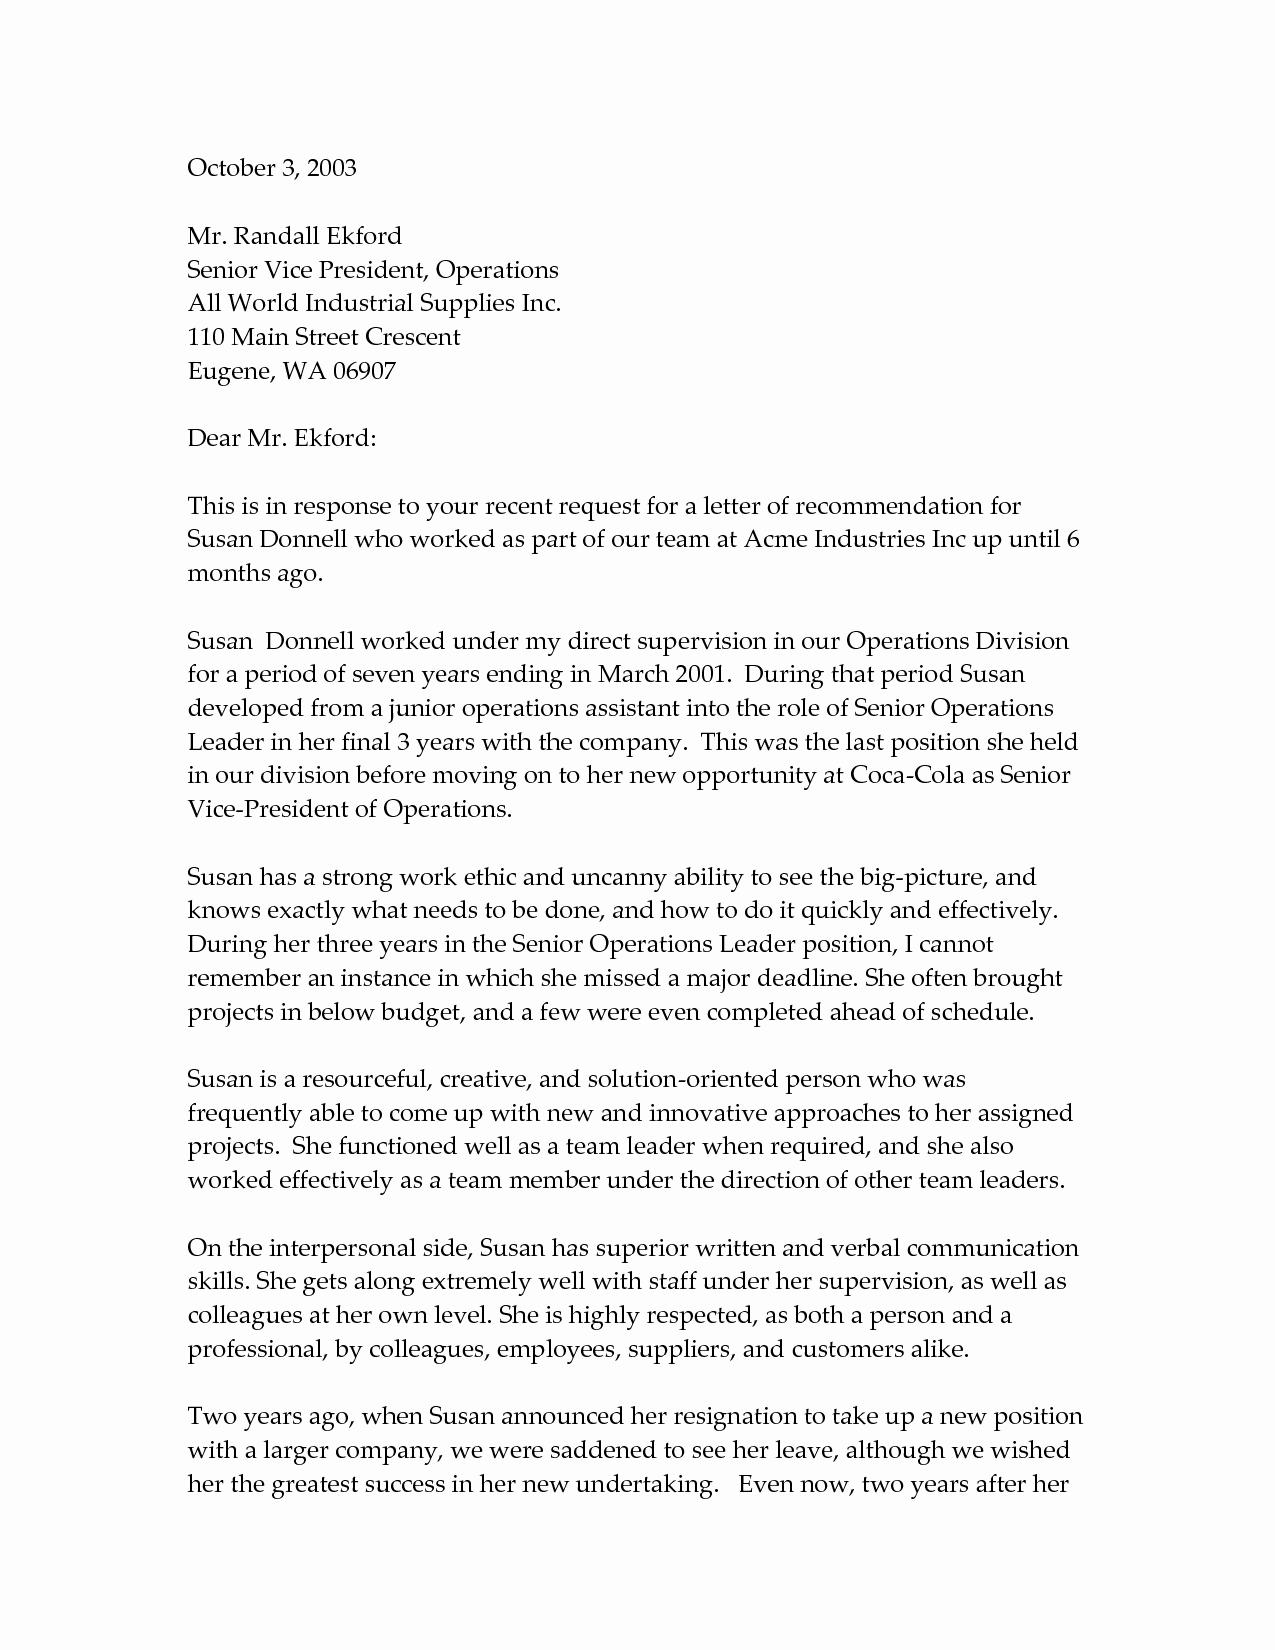 Professional Re Mendation Letter